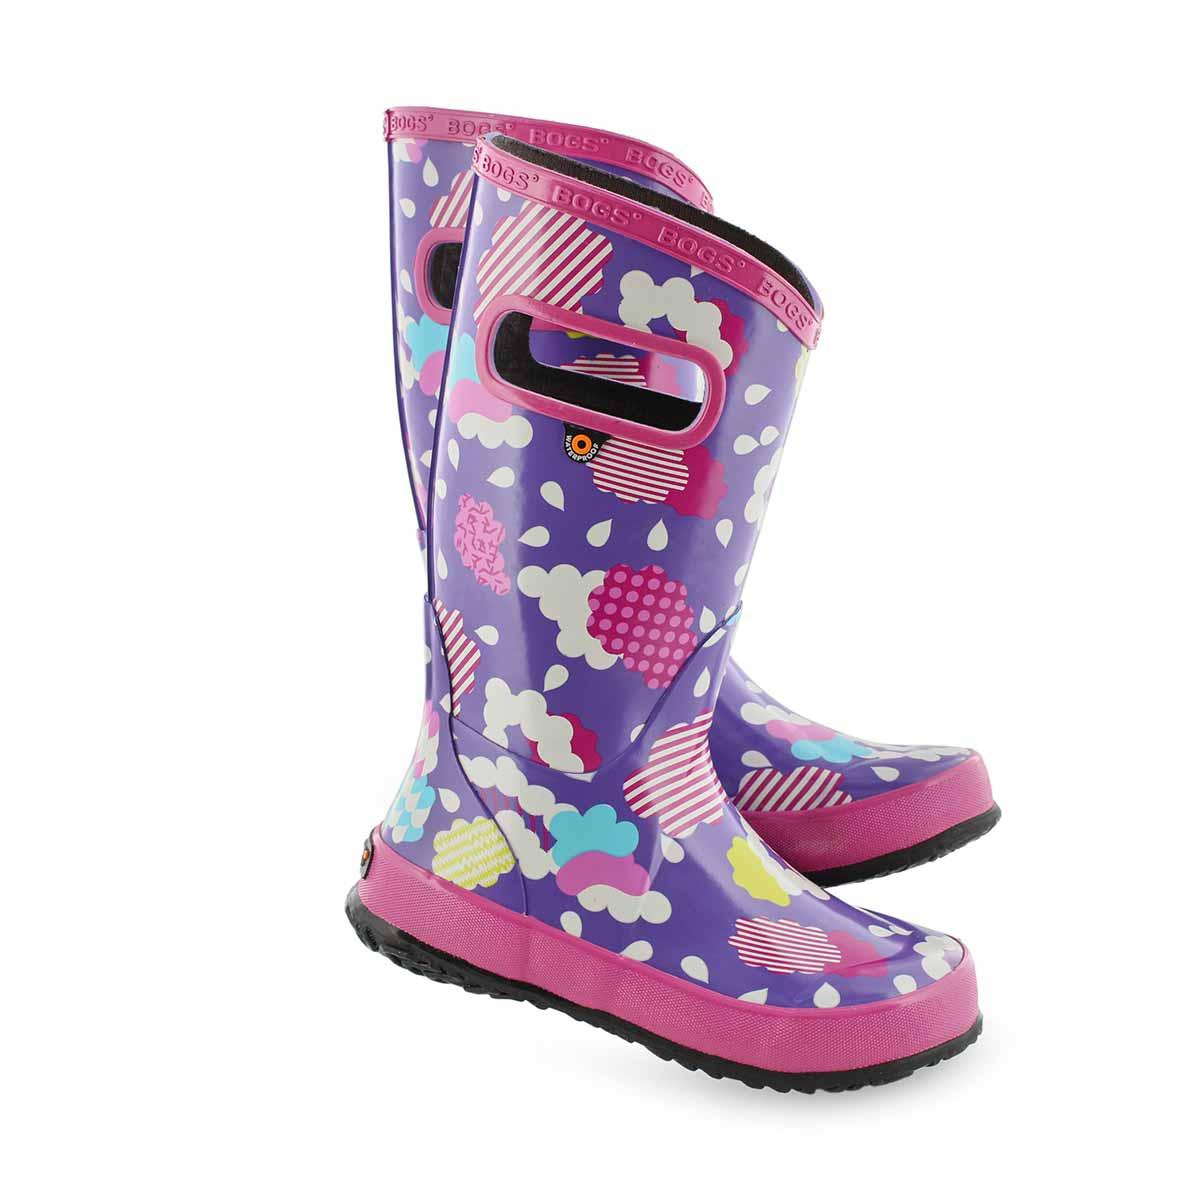 Grls Rain Boot Clouds vio mlti rain boot